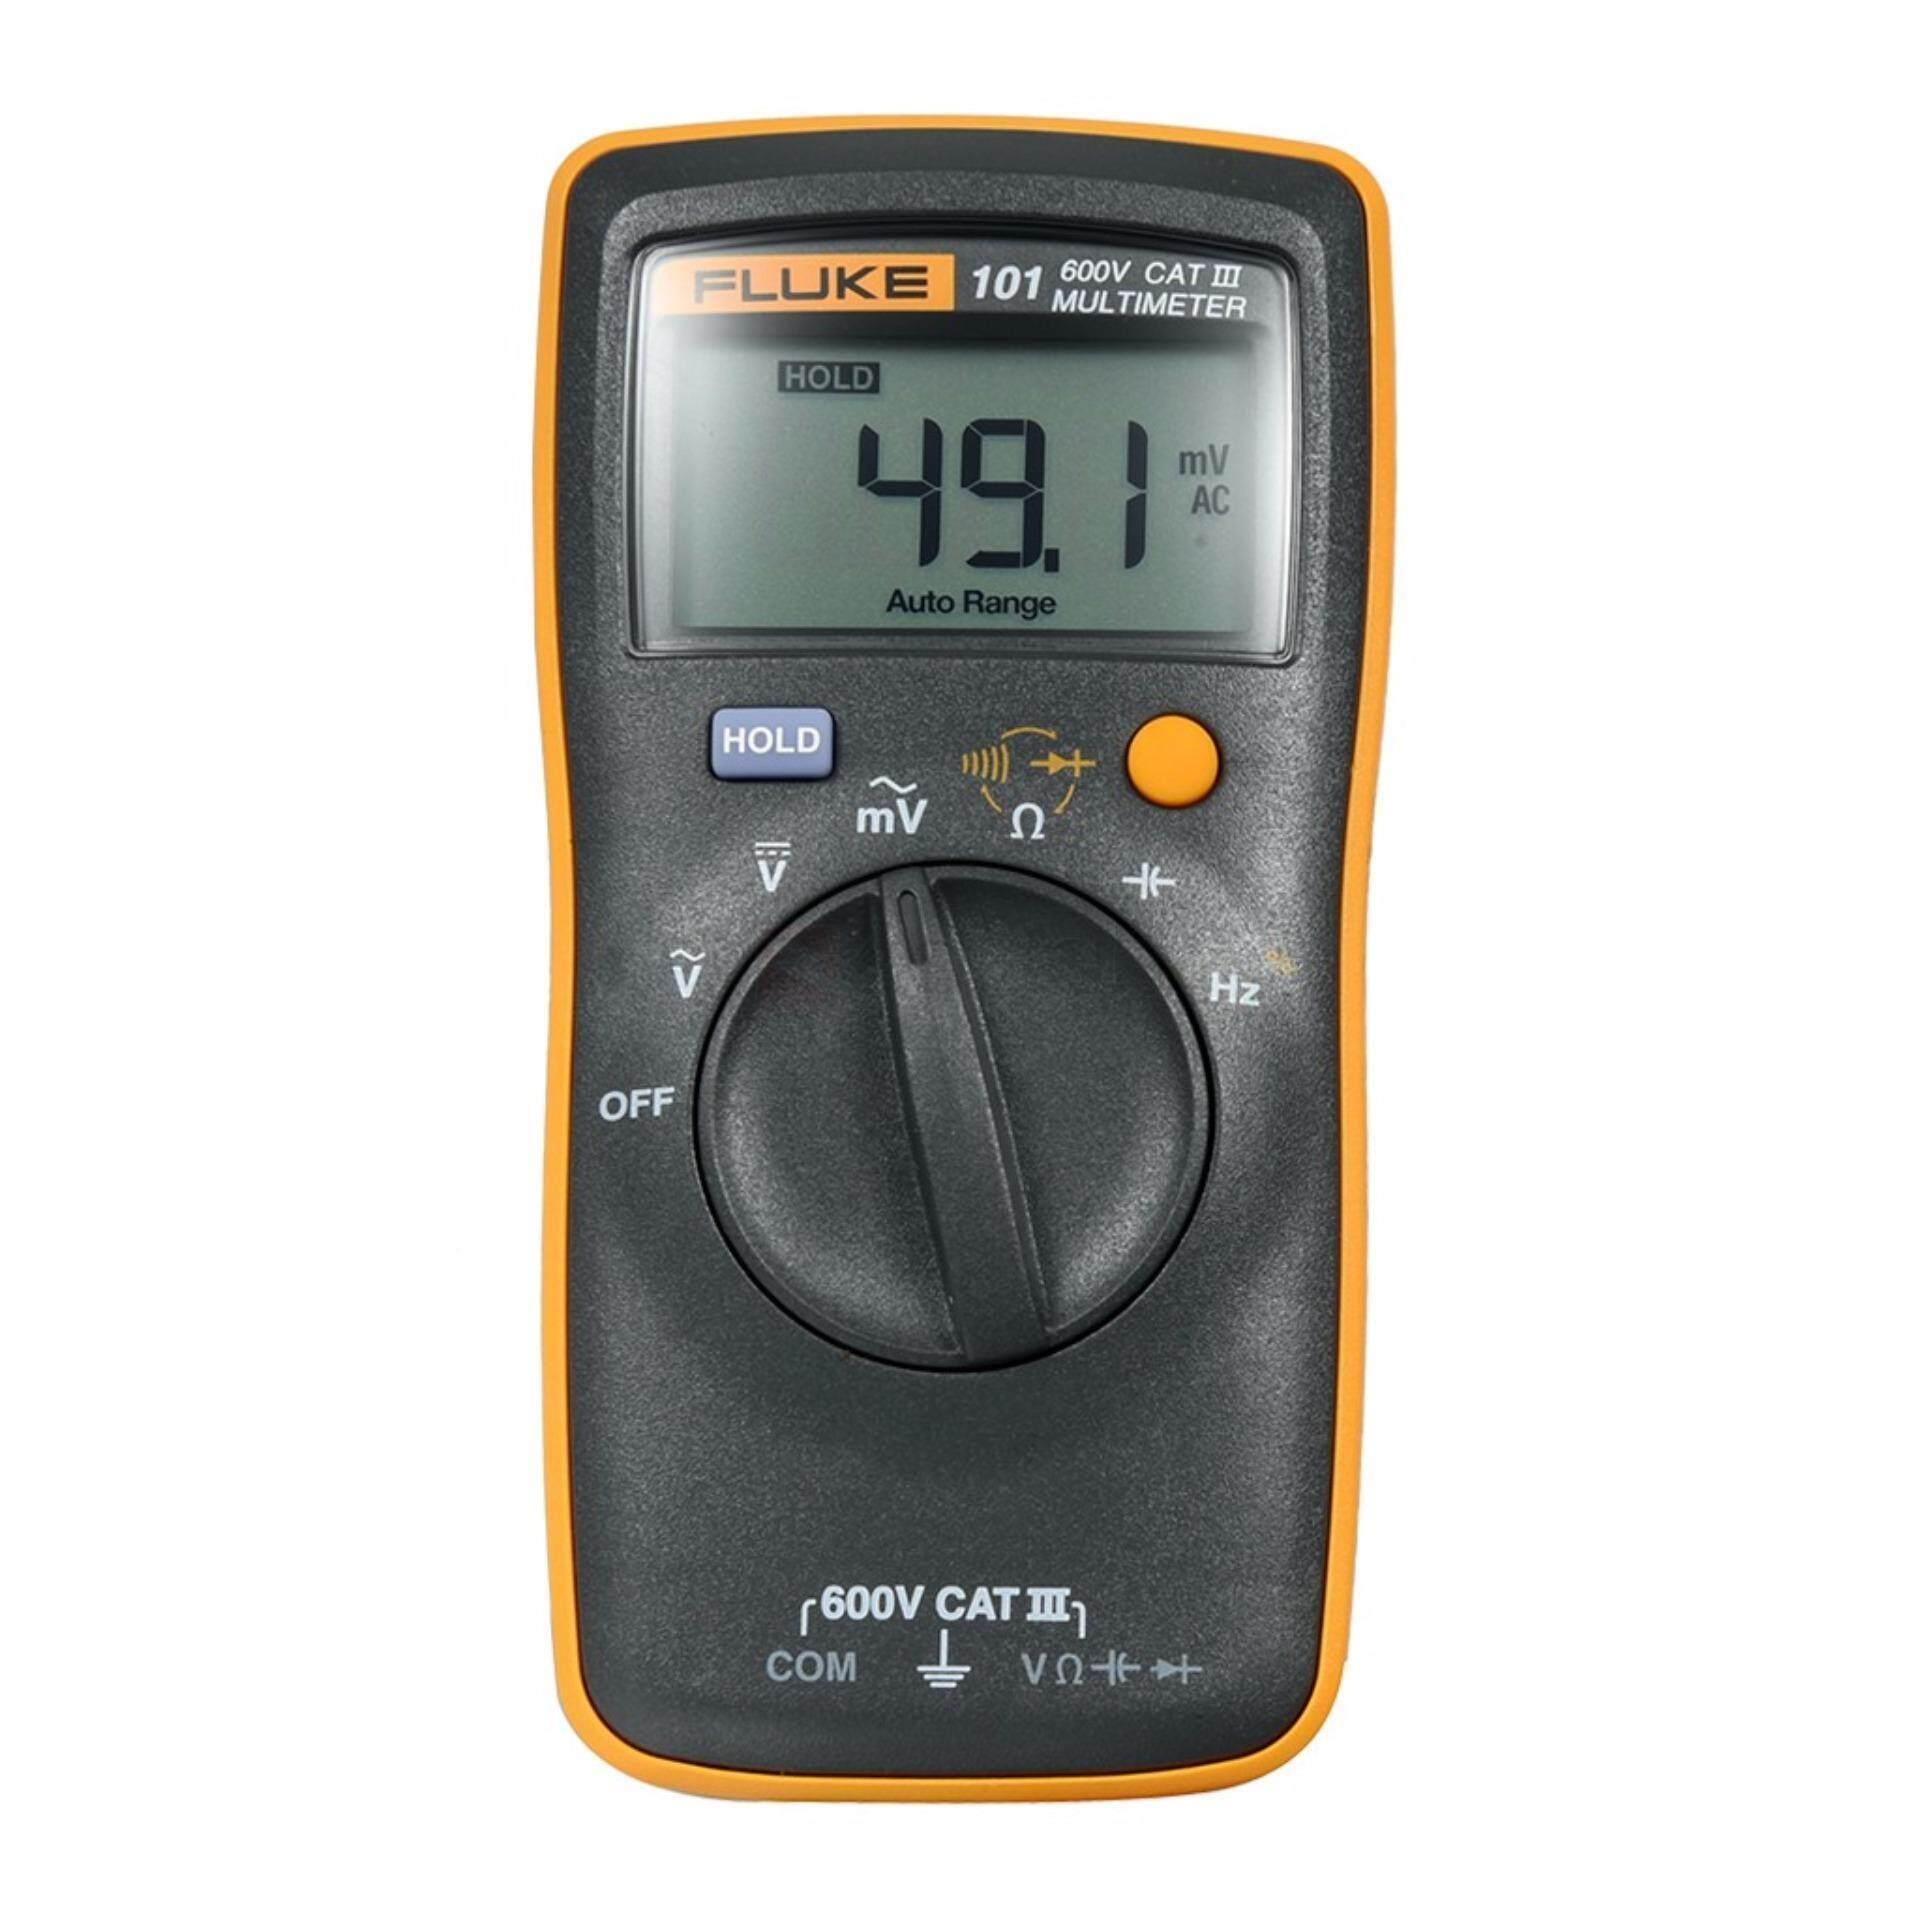 Eelic Mtn M50m Orange 50m Roll Meter Pengukur Terakurat Daftar Toda Meteran Fiber 165ft Fluke 101 600 V Kucing Iii Digital Multimeter Internasional 2